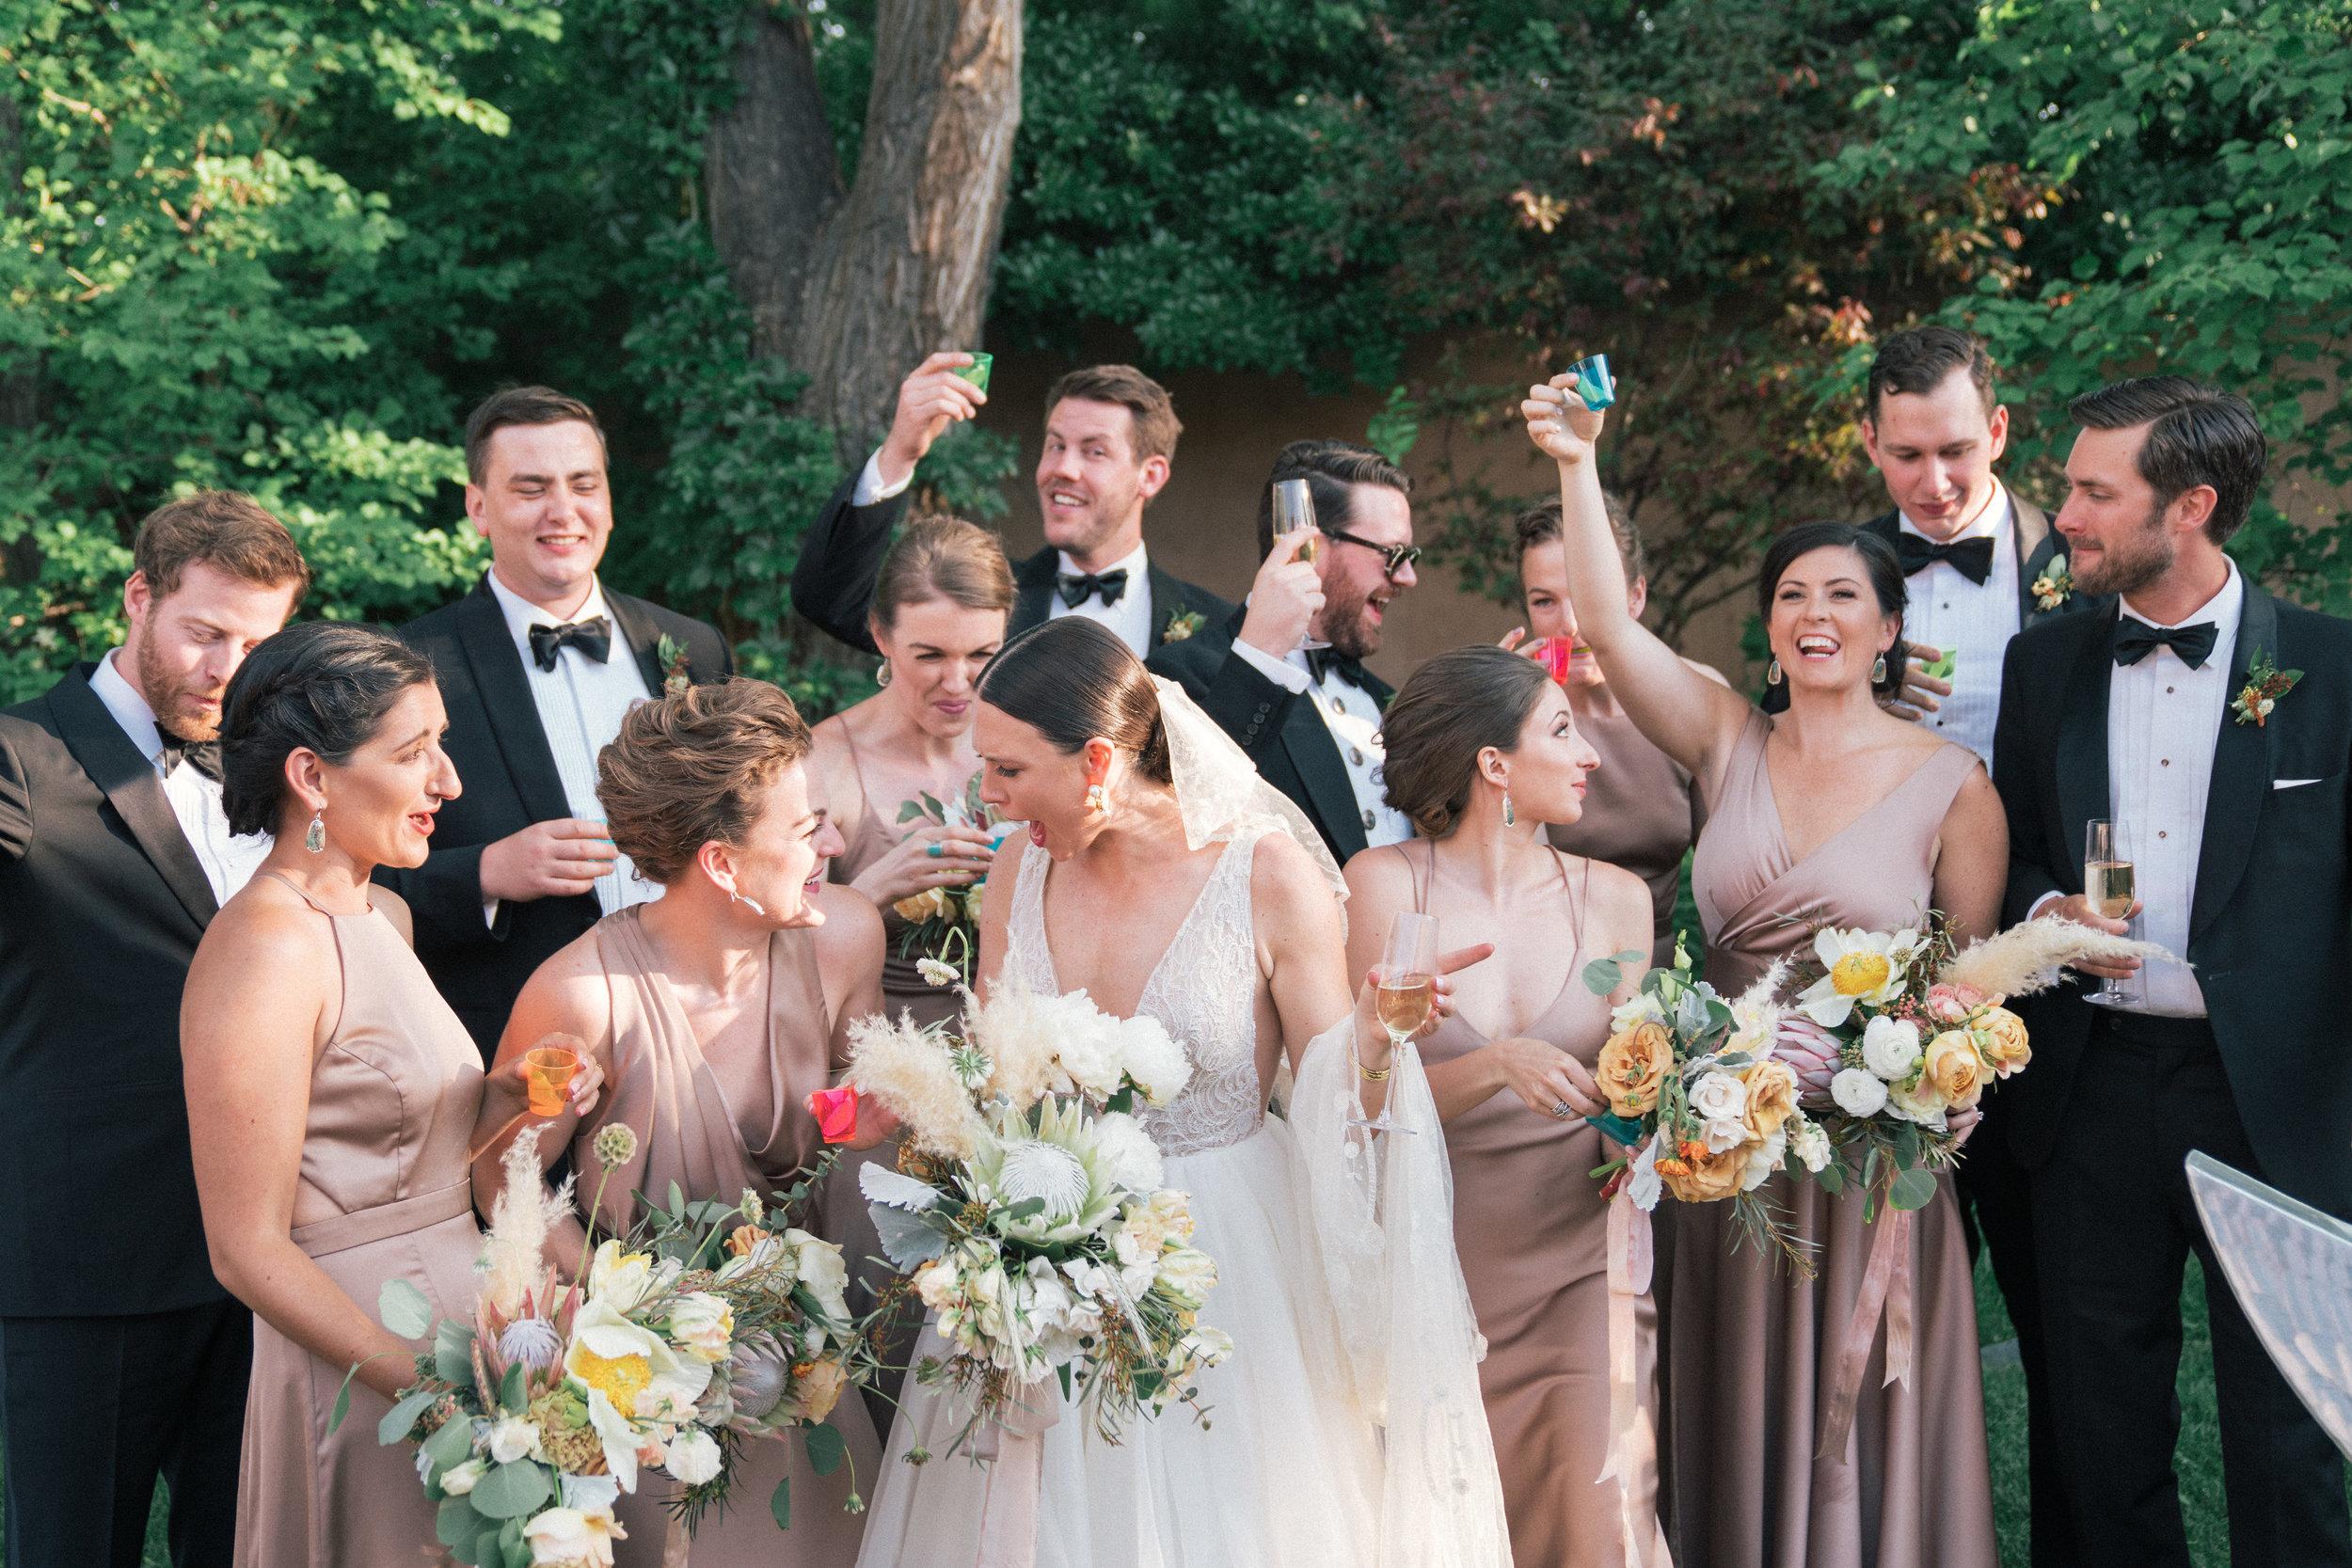 landry_lovelace_wedding_jbobephoto-639.jpg